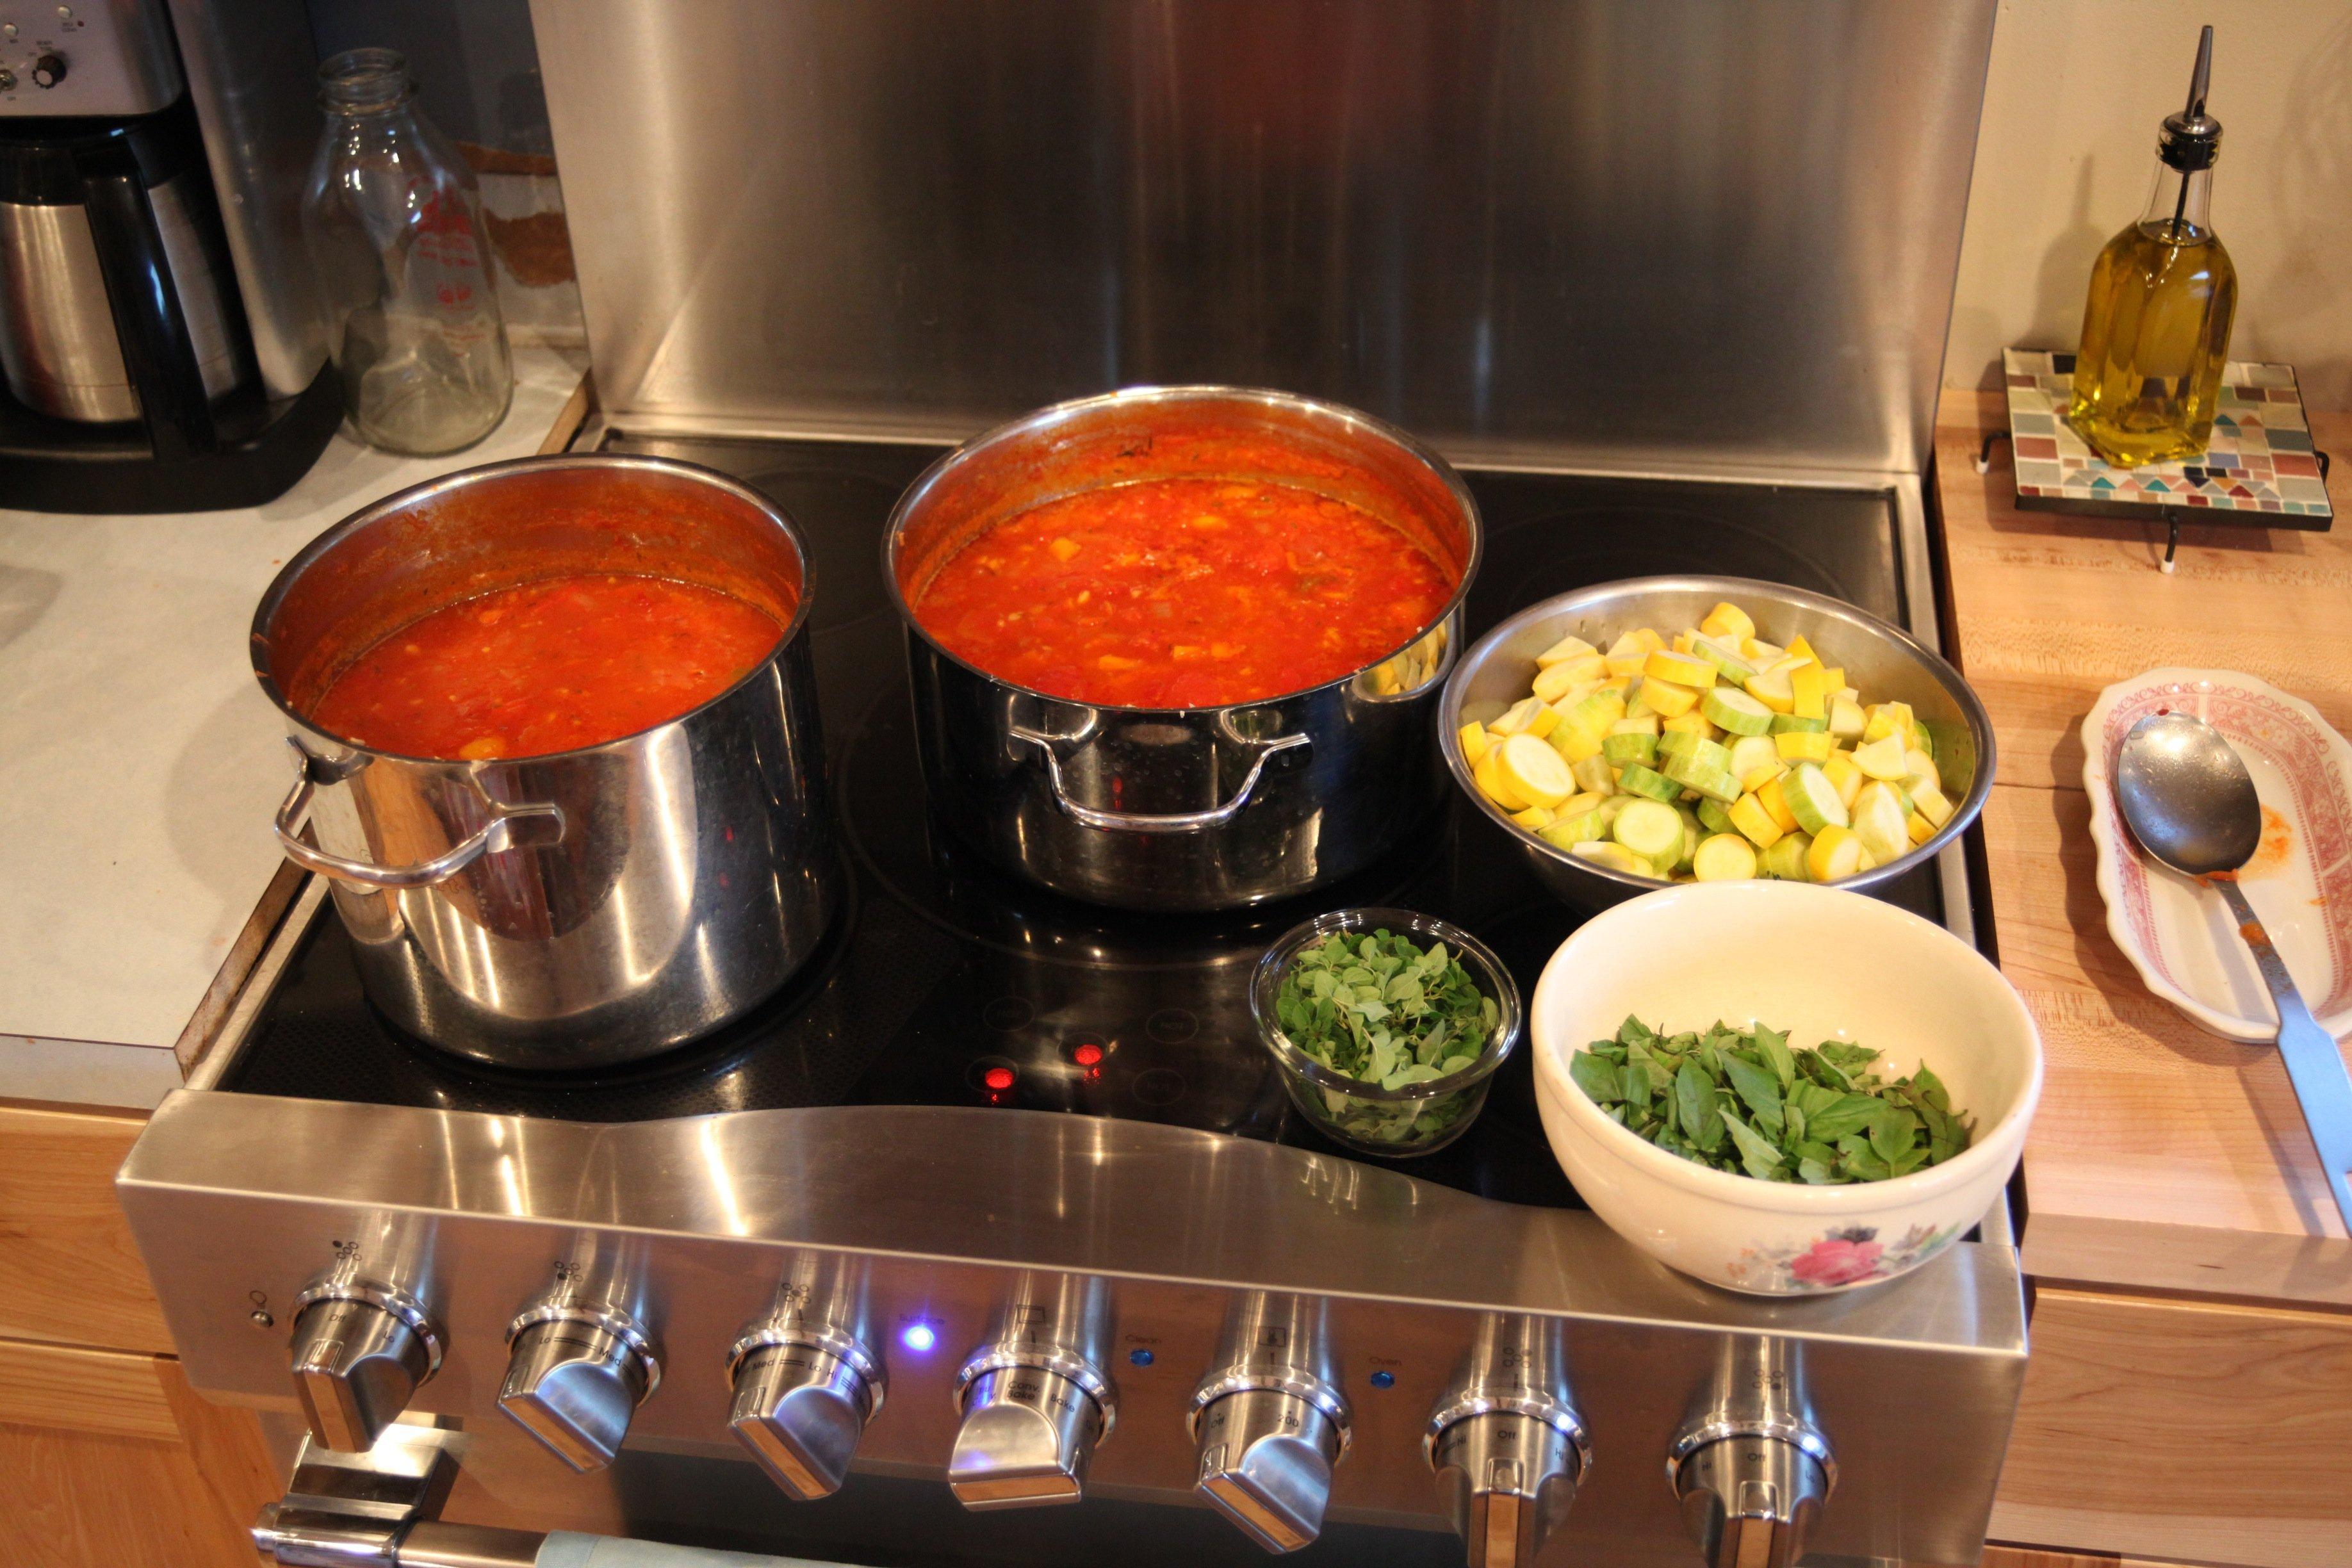 tomato sauce #2